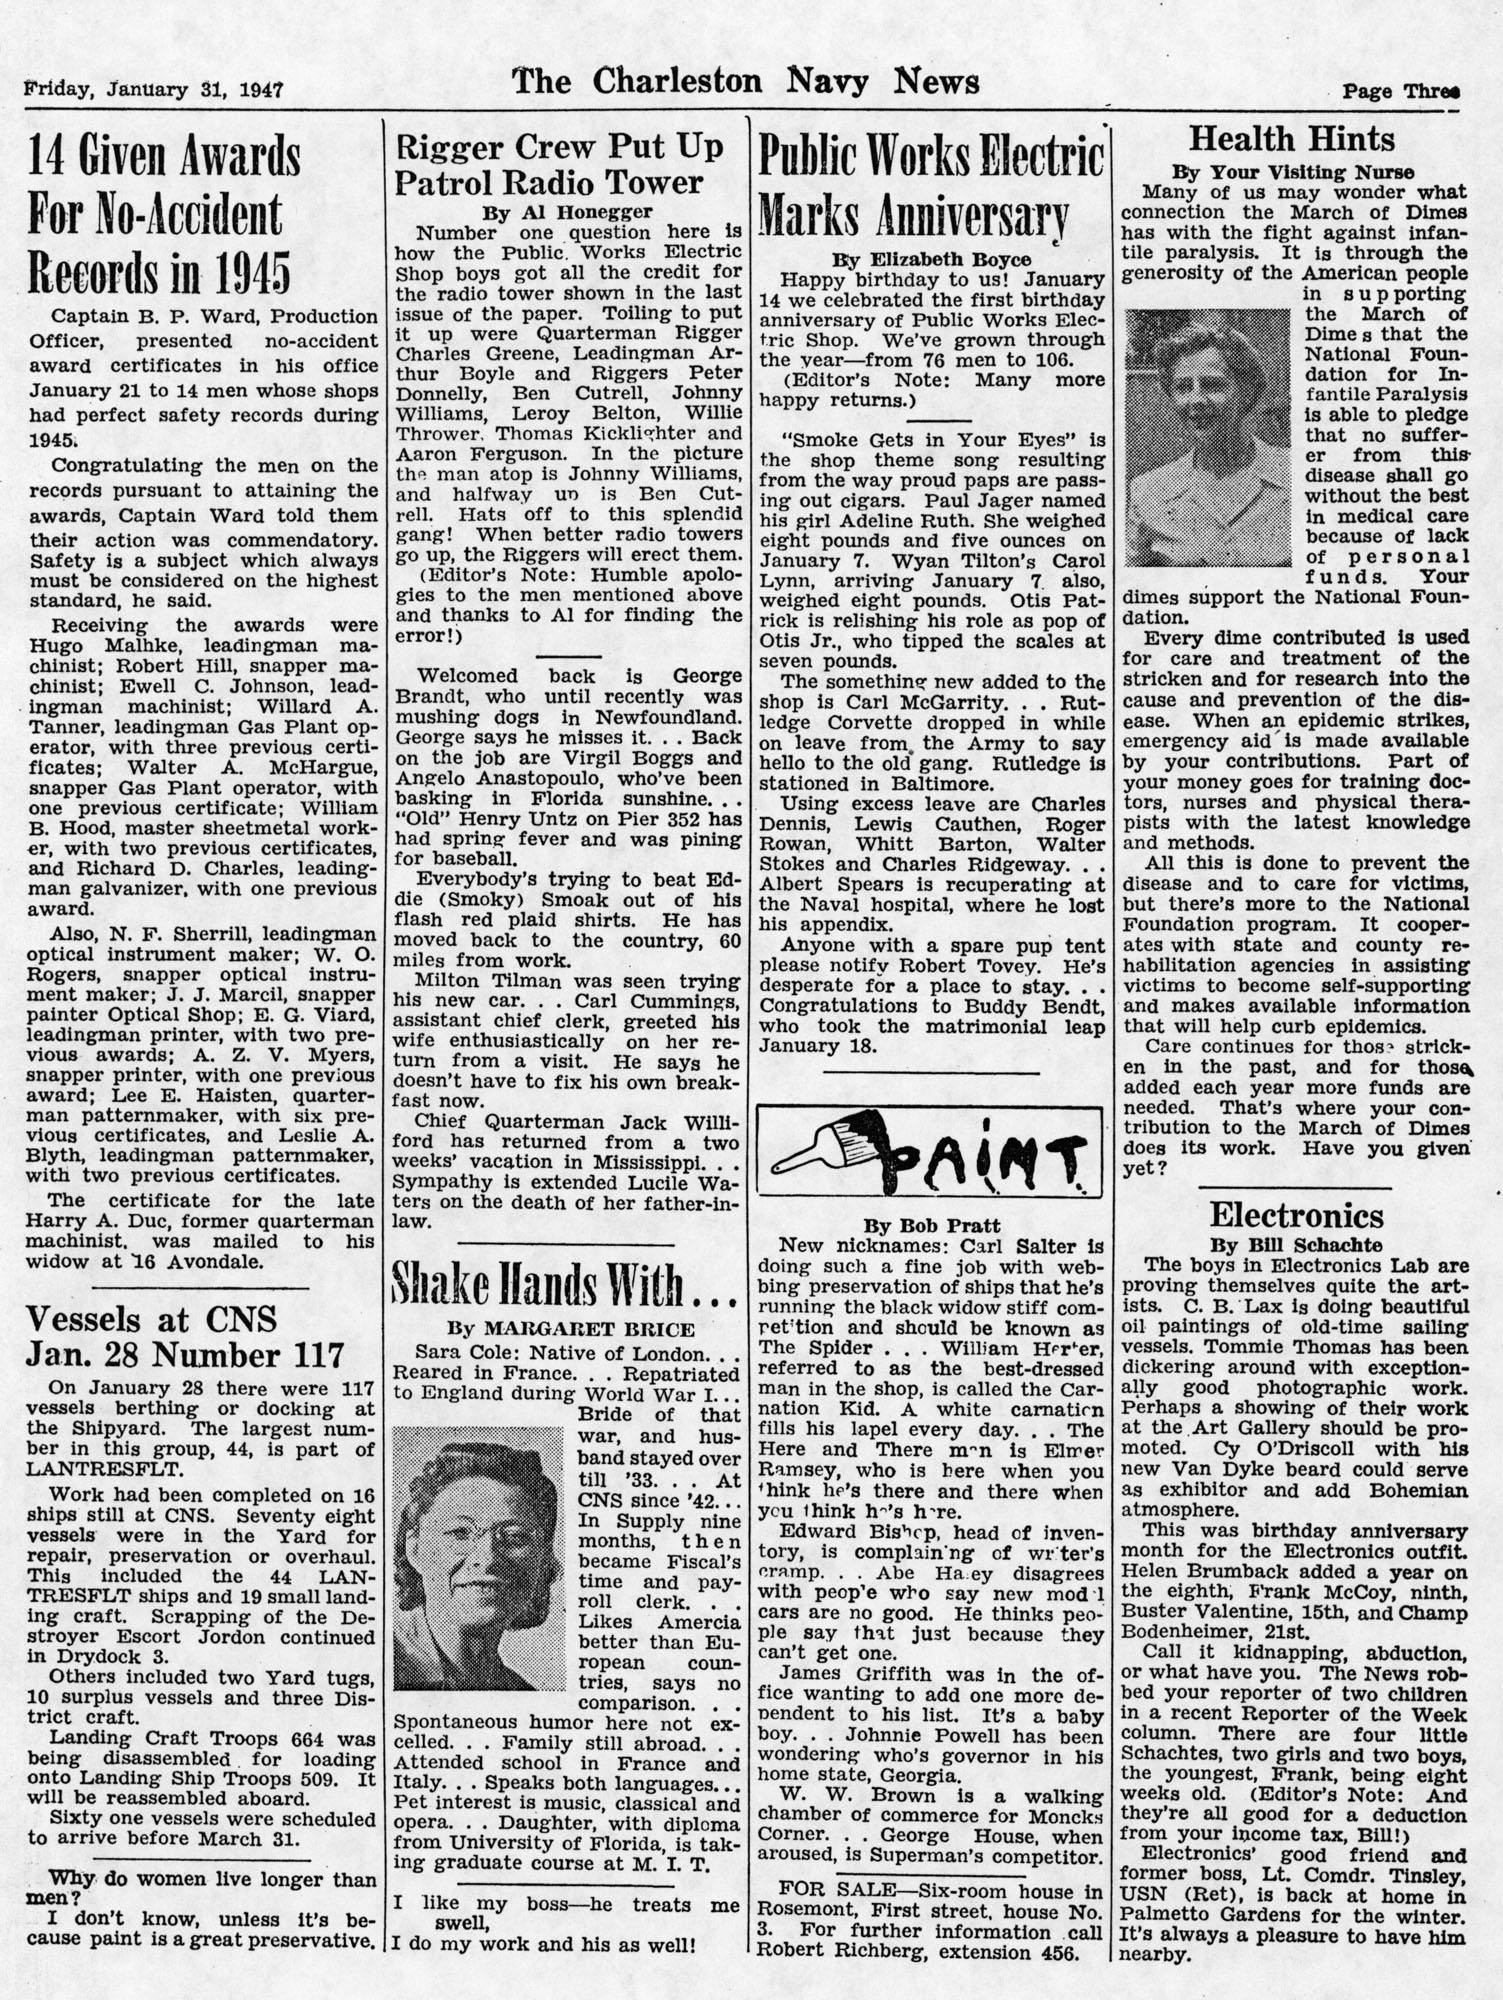 The Charleston Navy News, Volume 5, Edition 13, page iii